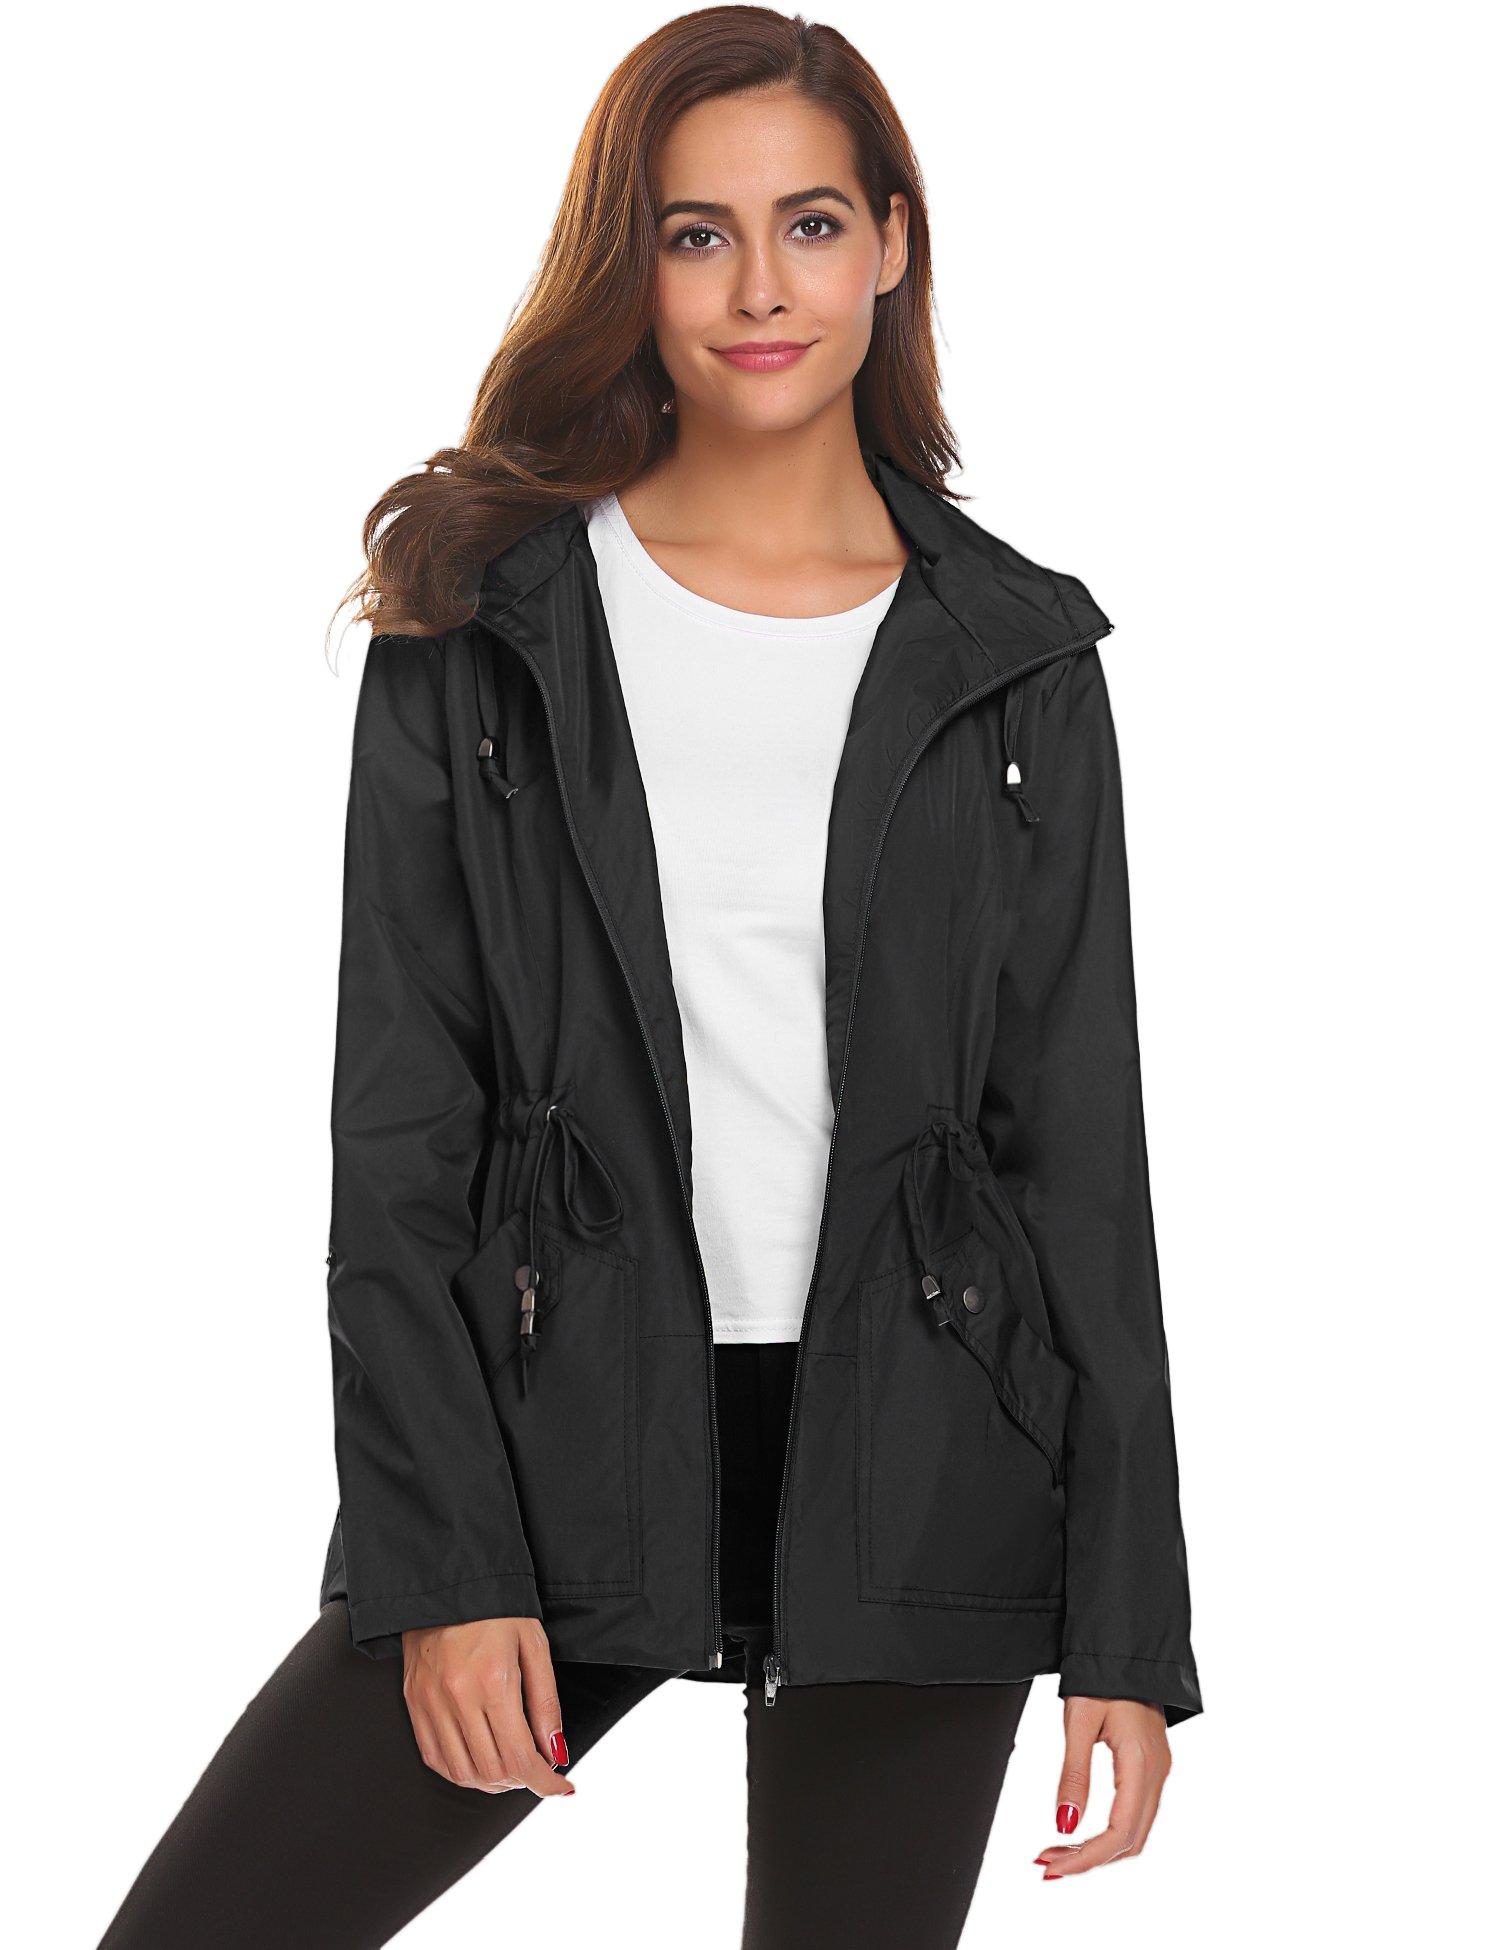 Romanstii Lightweight Coats for Women,Windbreaker Rain Jacket with Mesh Liner Black,XL by Romanstii